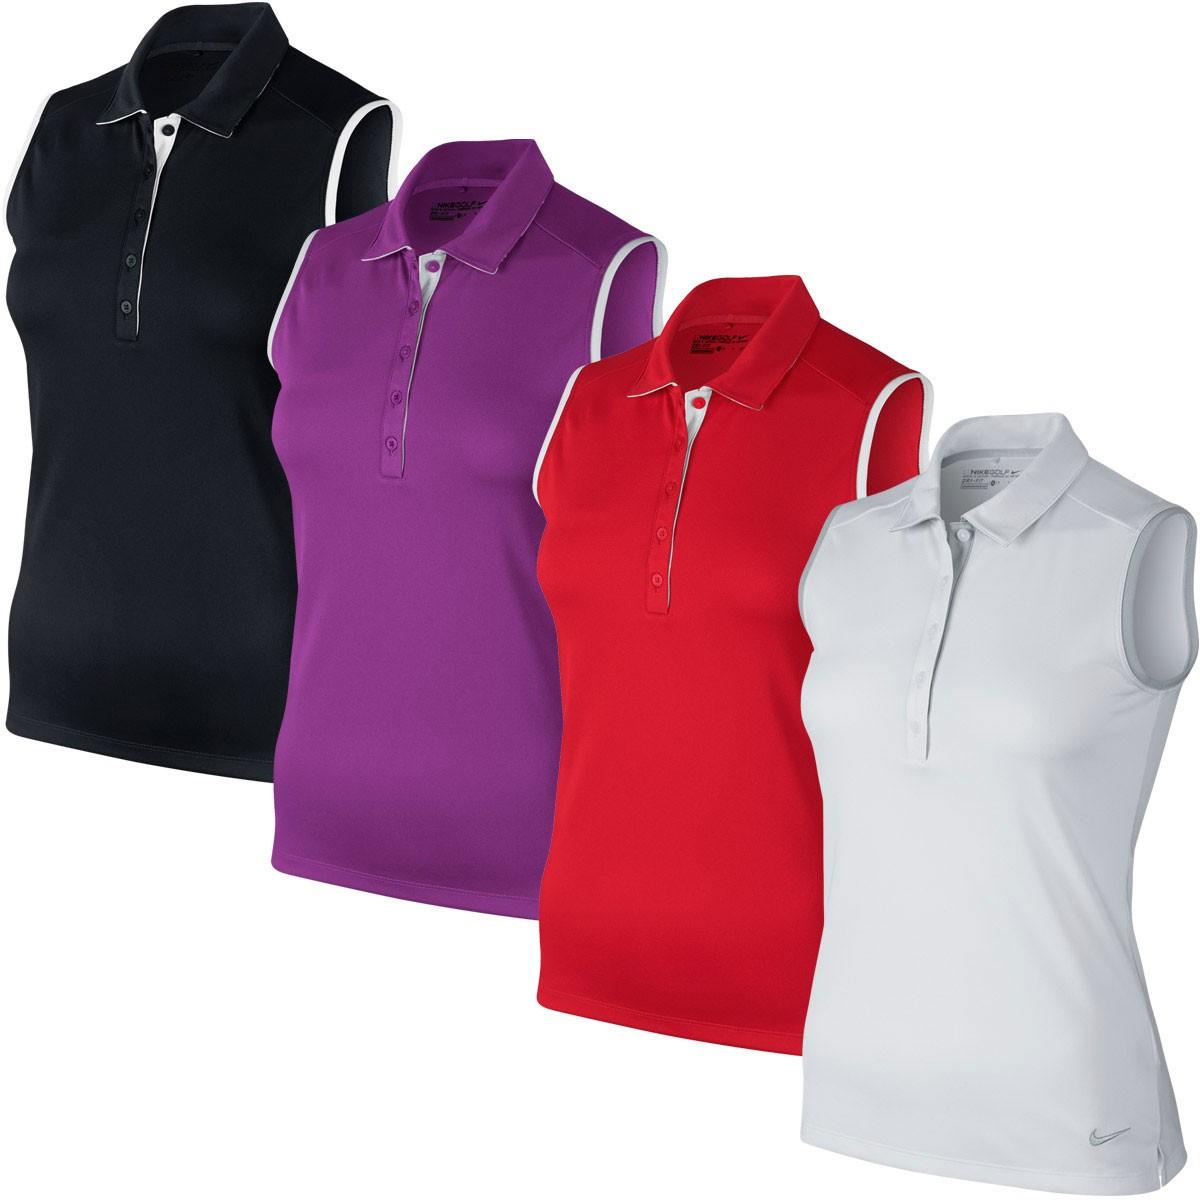 Nike Womens Tour Sleeveless   Polo Shirt